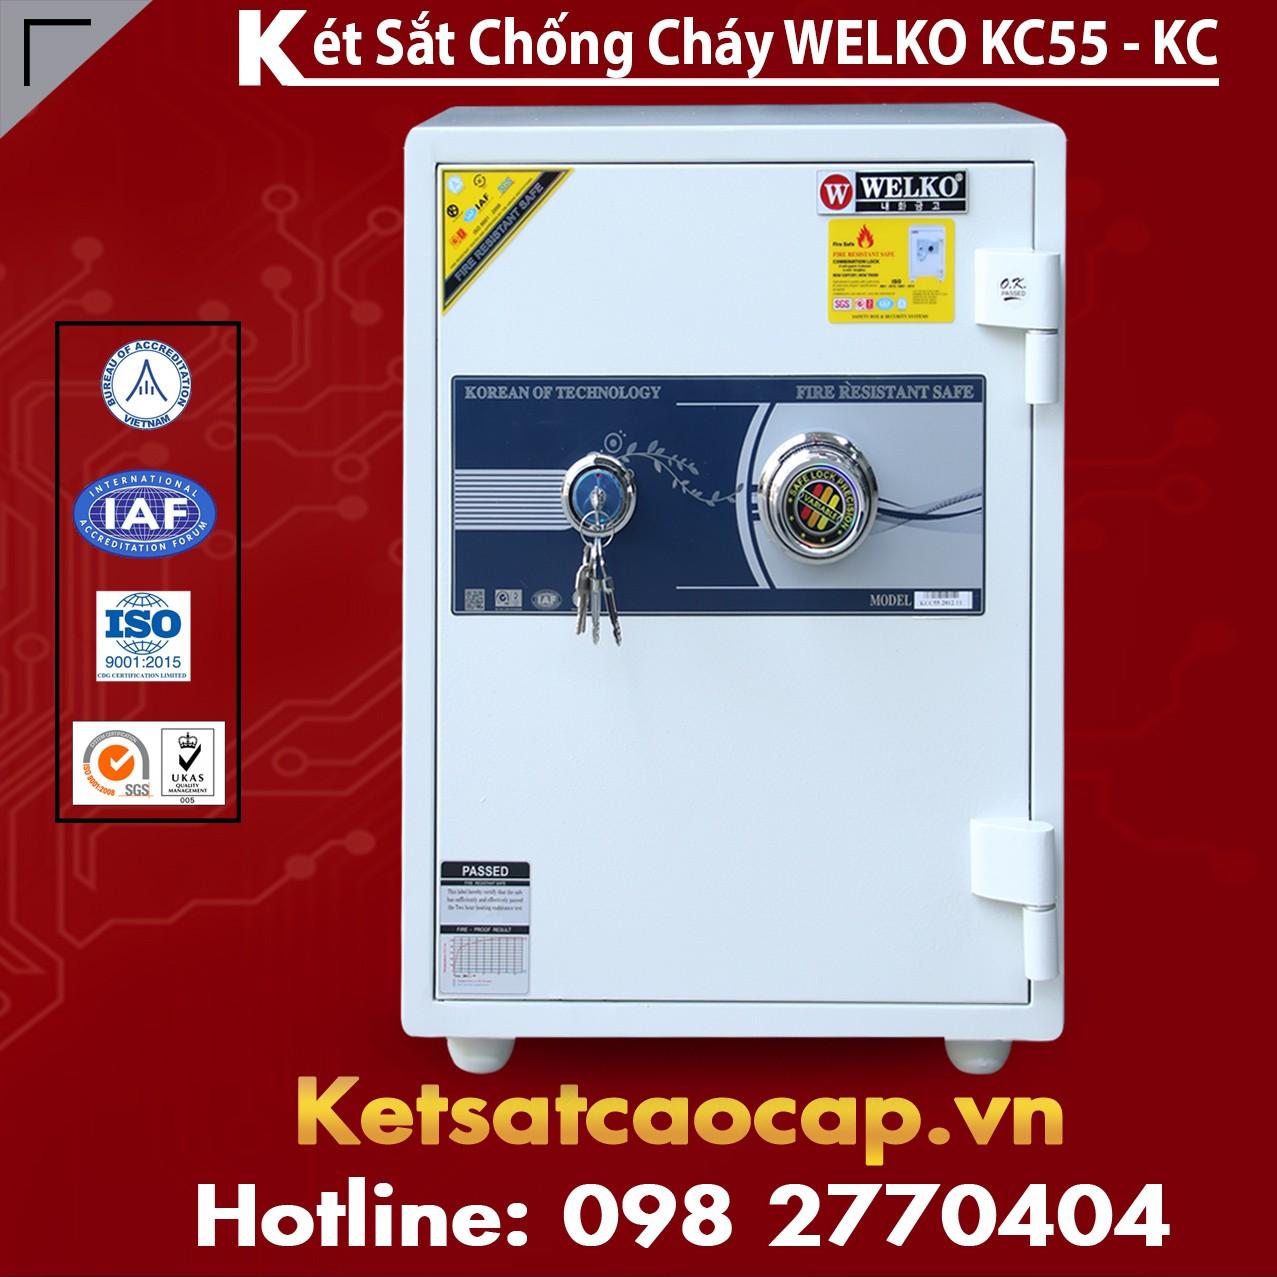 Mua Két Sắt KCC55 White - KC